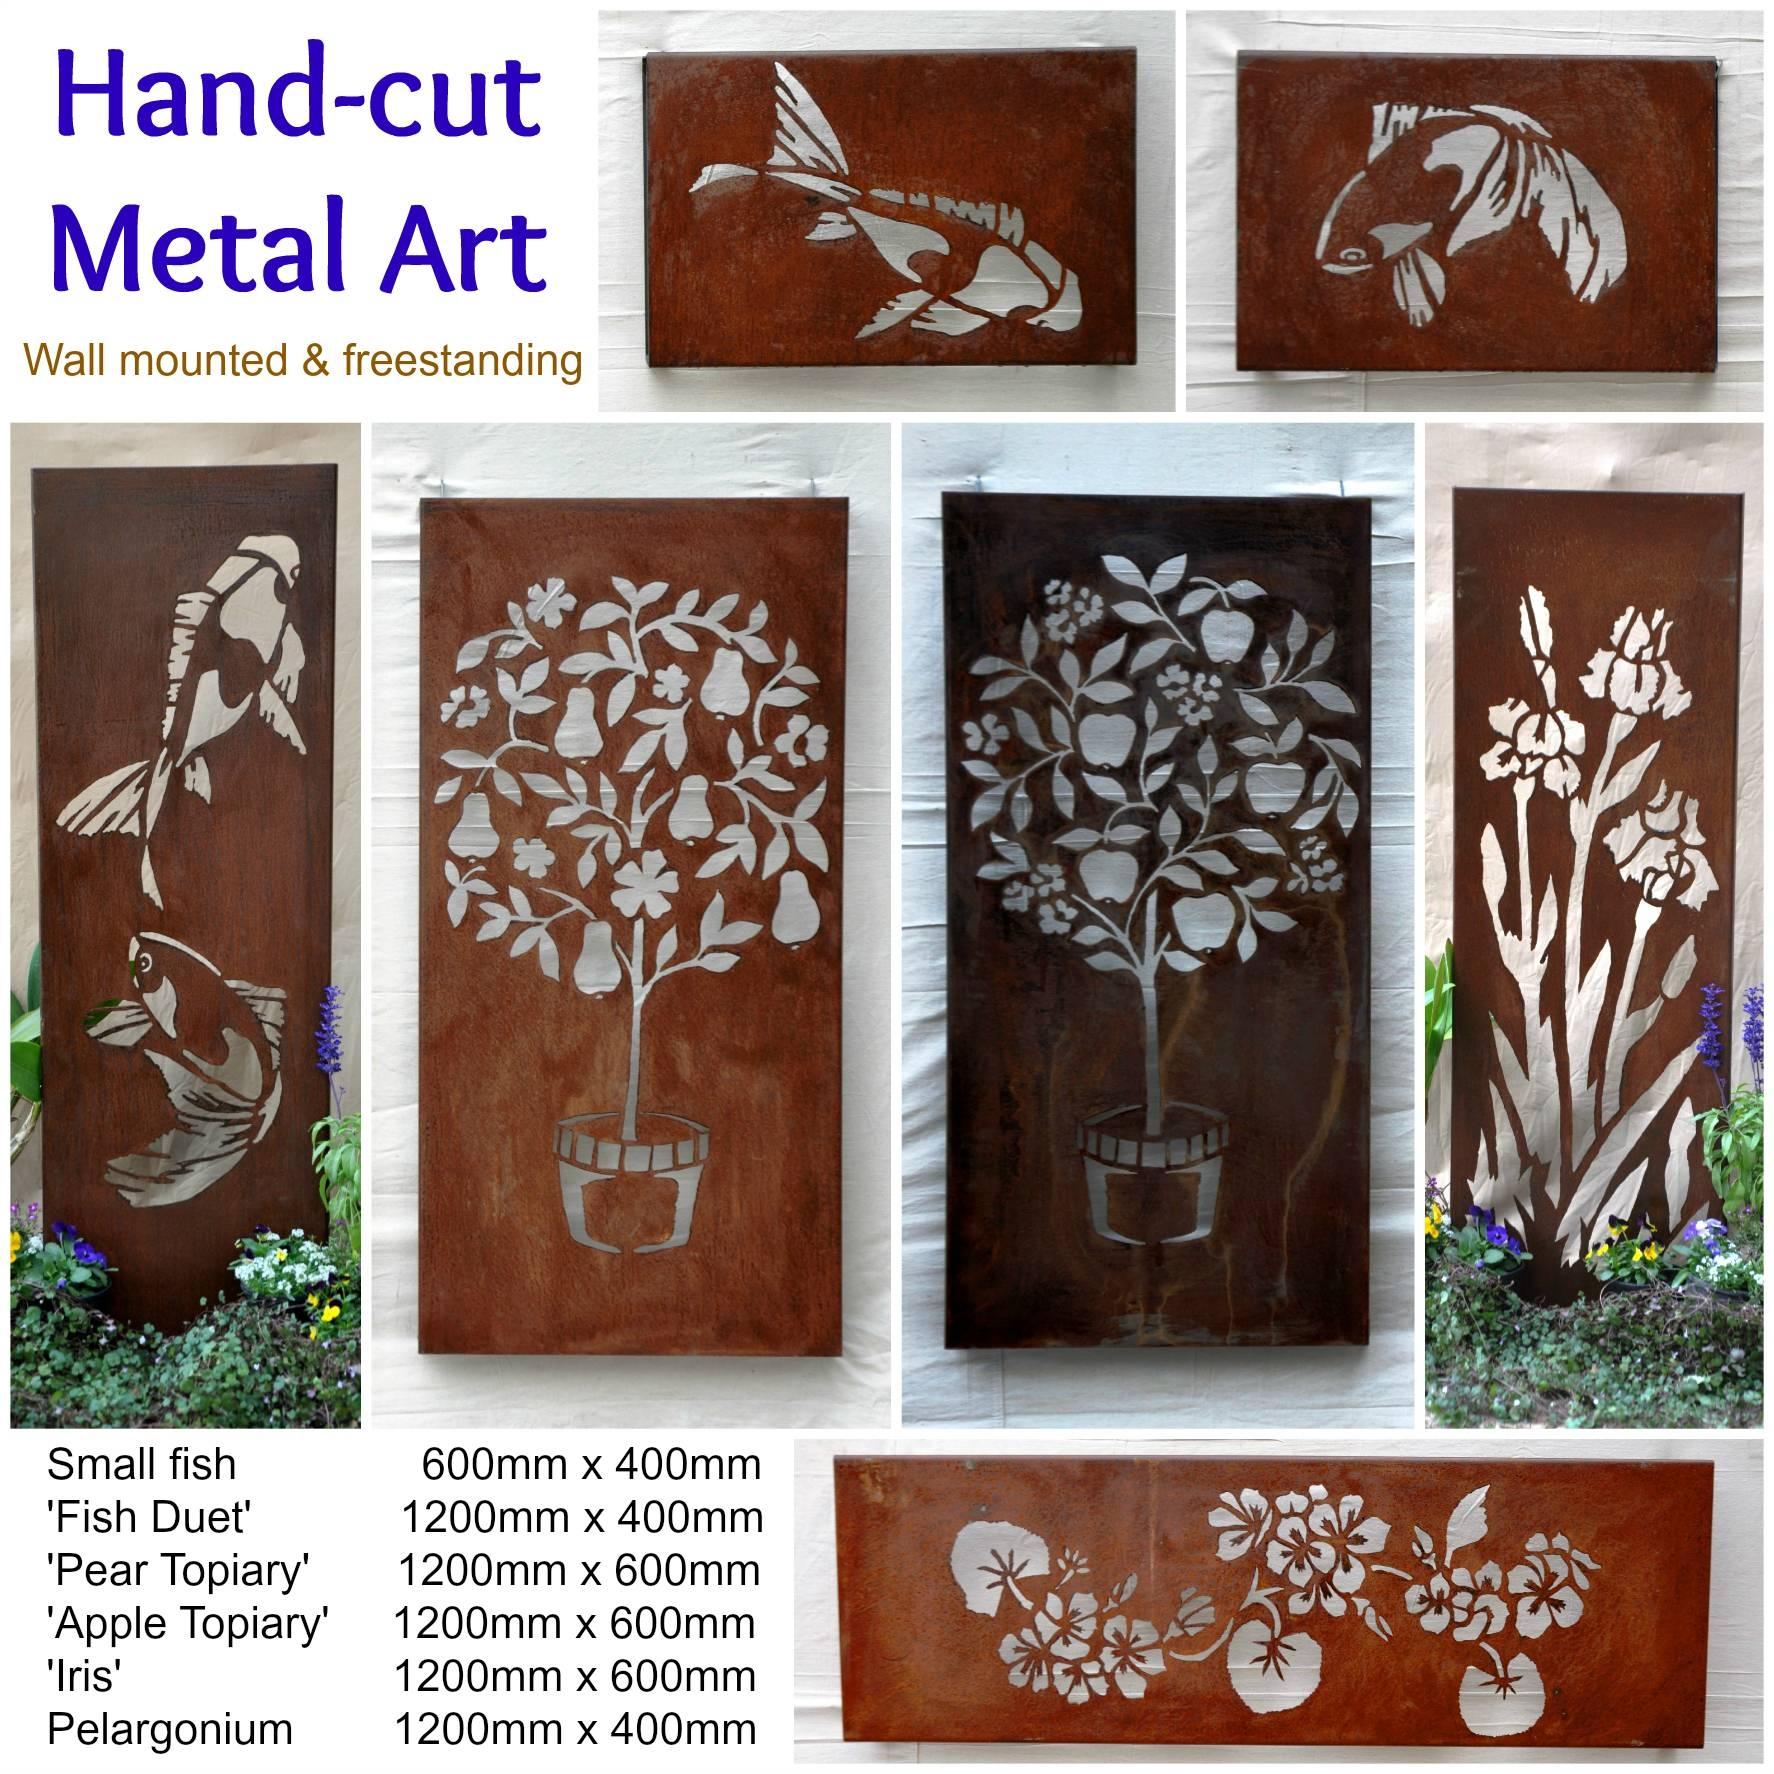 Australian Metal Artwork, Garden Art, Metal Wall Art | Farmweld Throughout Most Popular Rusted Metal Wall Art (View 4 of 20)